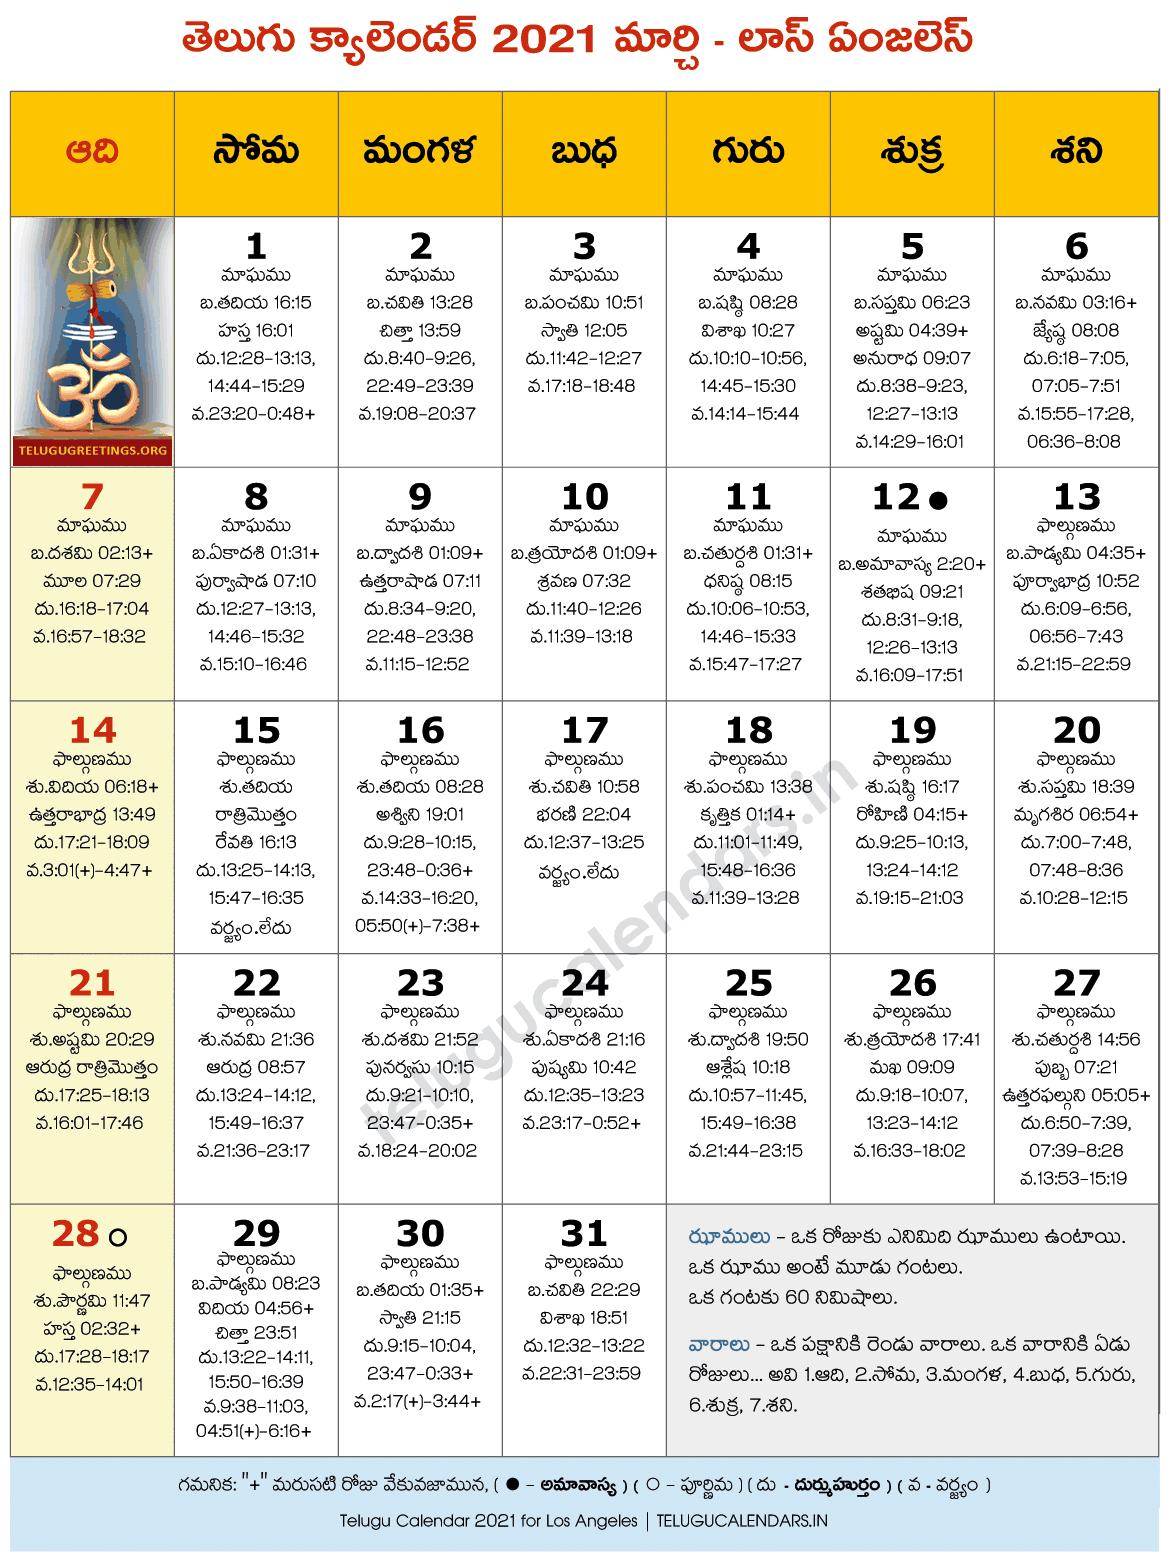 Los Angeles 2021 March Telugu Calendar | Telugu Calendars